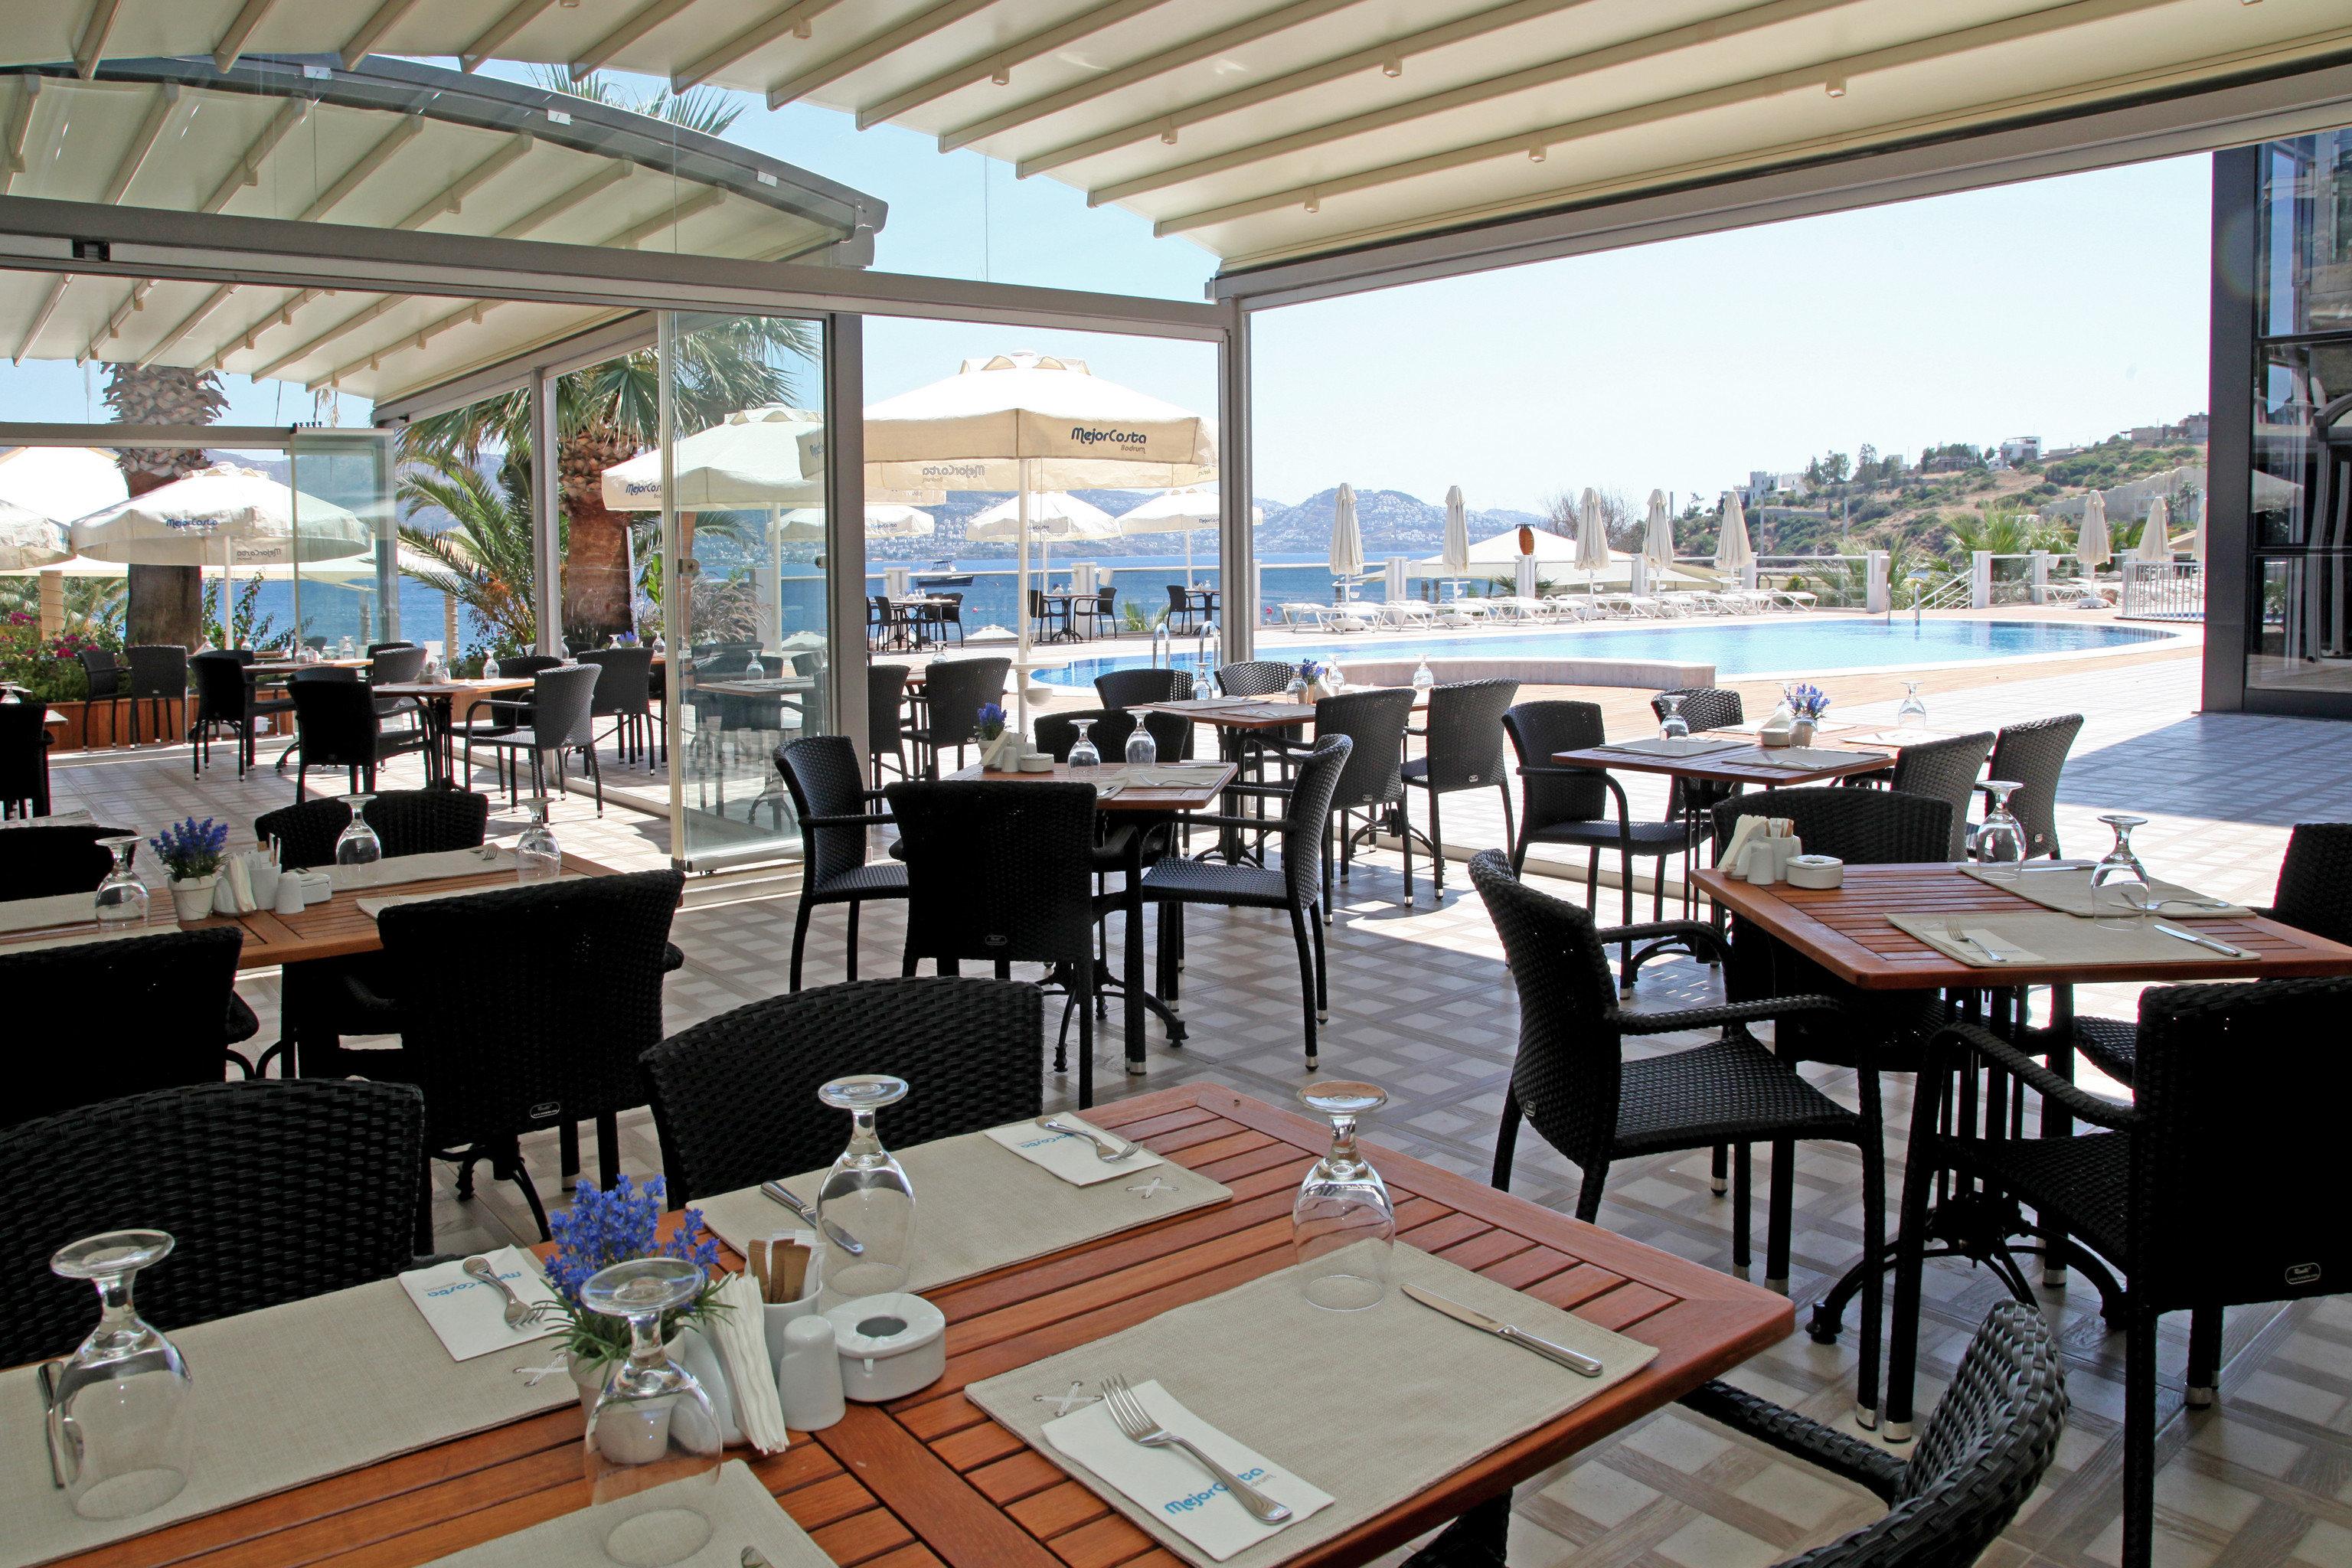 Dining Drink Eat Modern Outdoors Waterfront property restaurant Resort vehicle overlooking